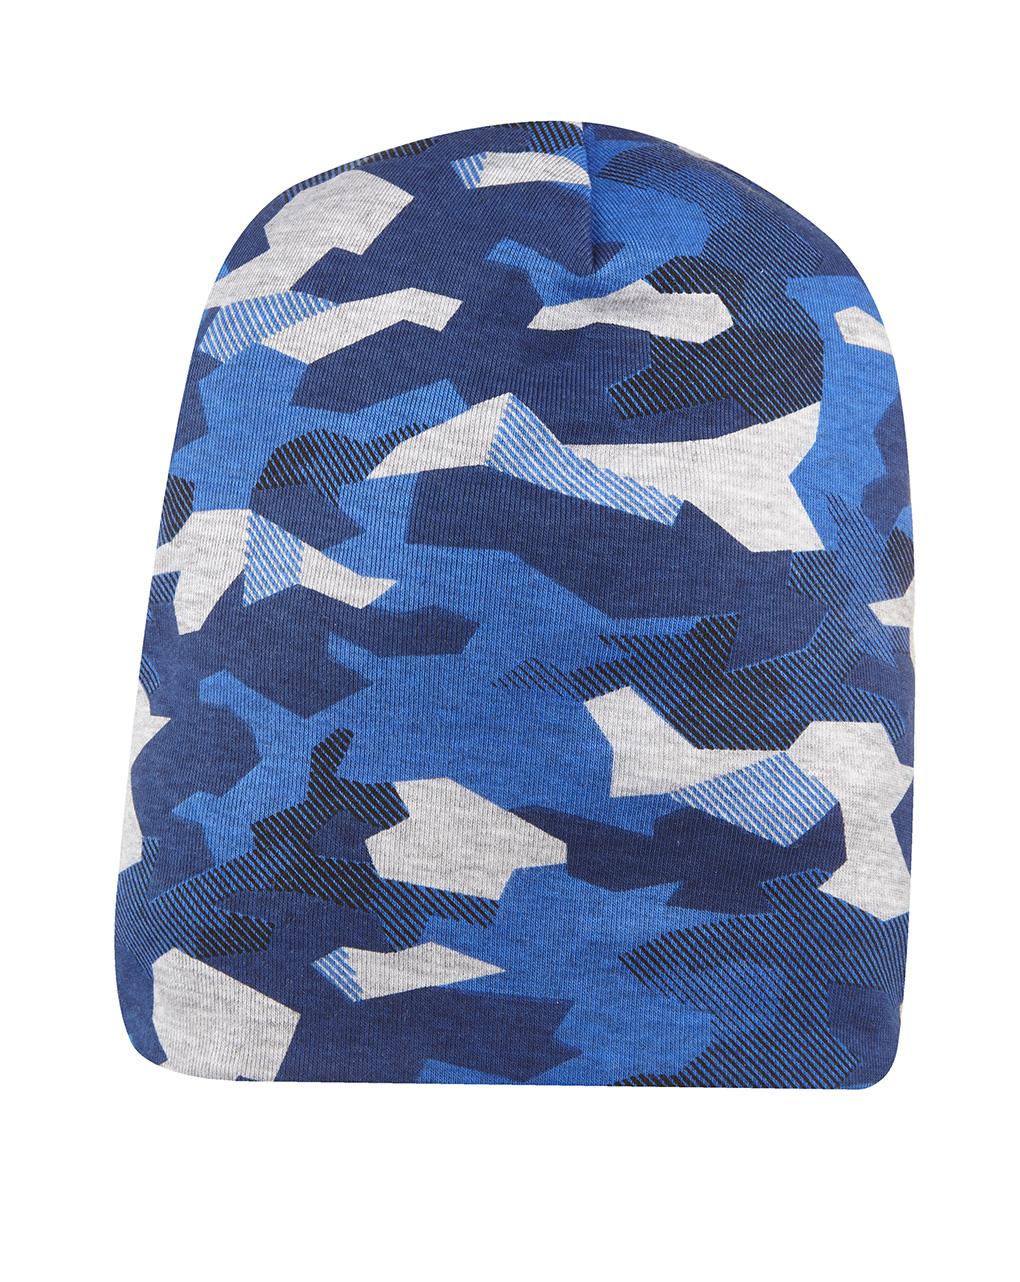 Cppellino fantasia camouflage - Essential by Prénatal, Prénatal